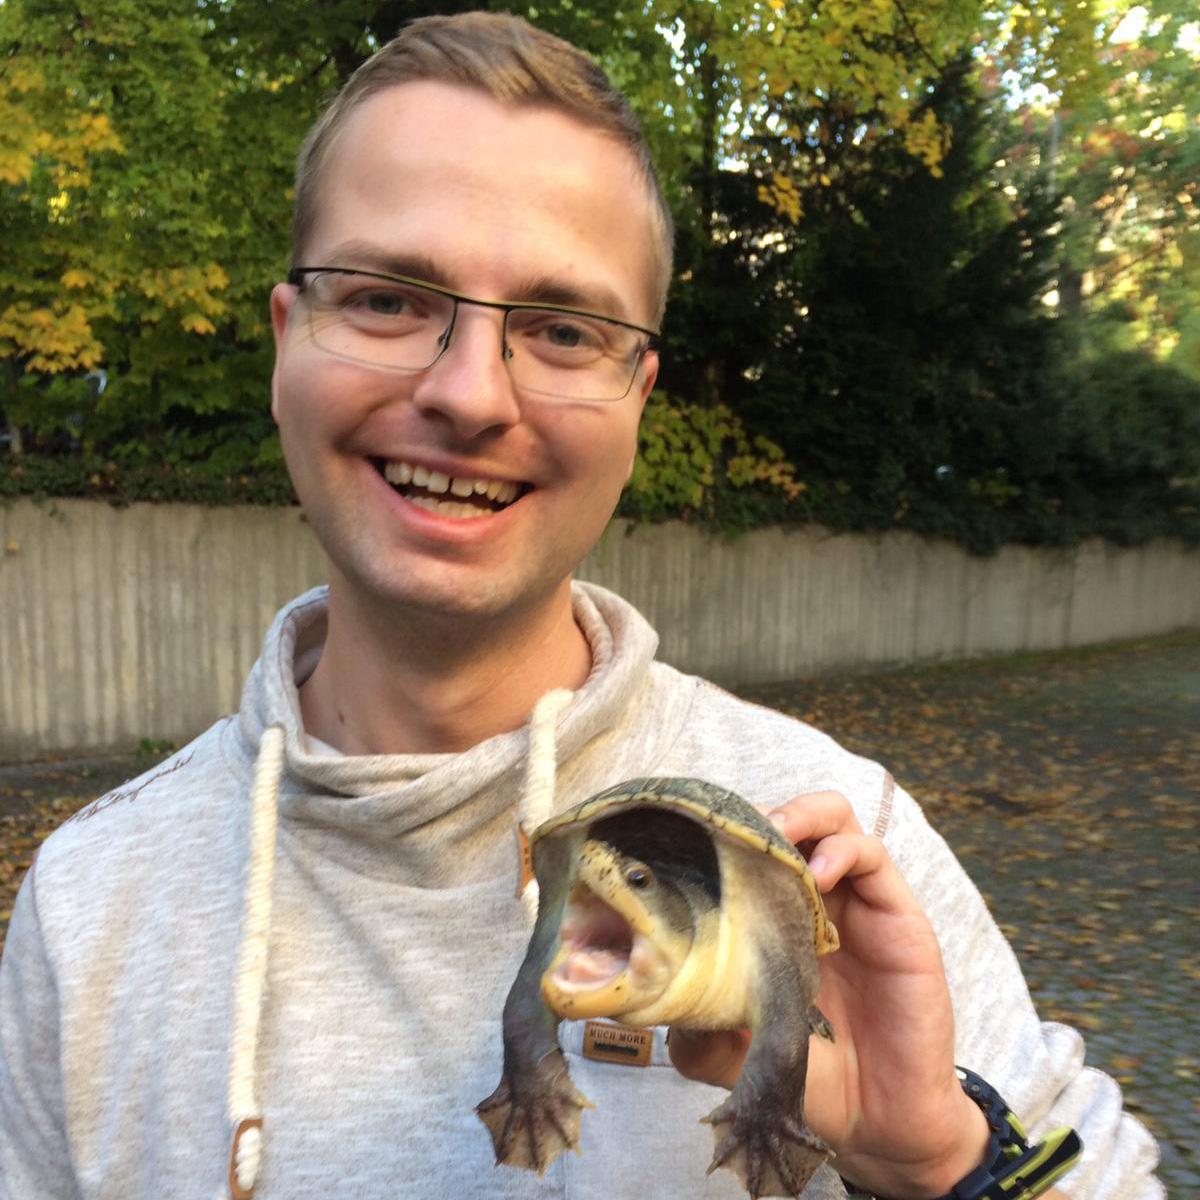 A photograph of Christoph Leineweber.